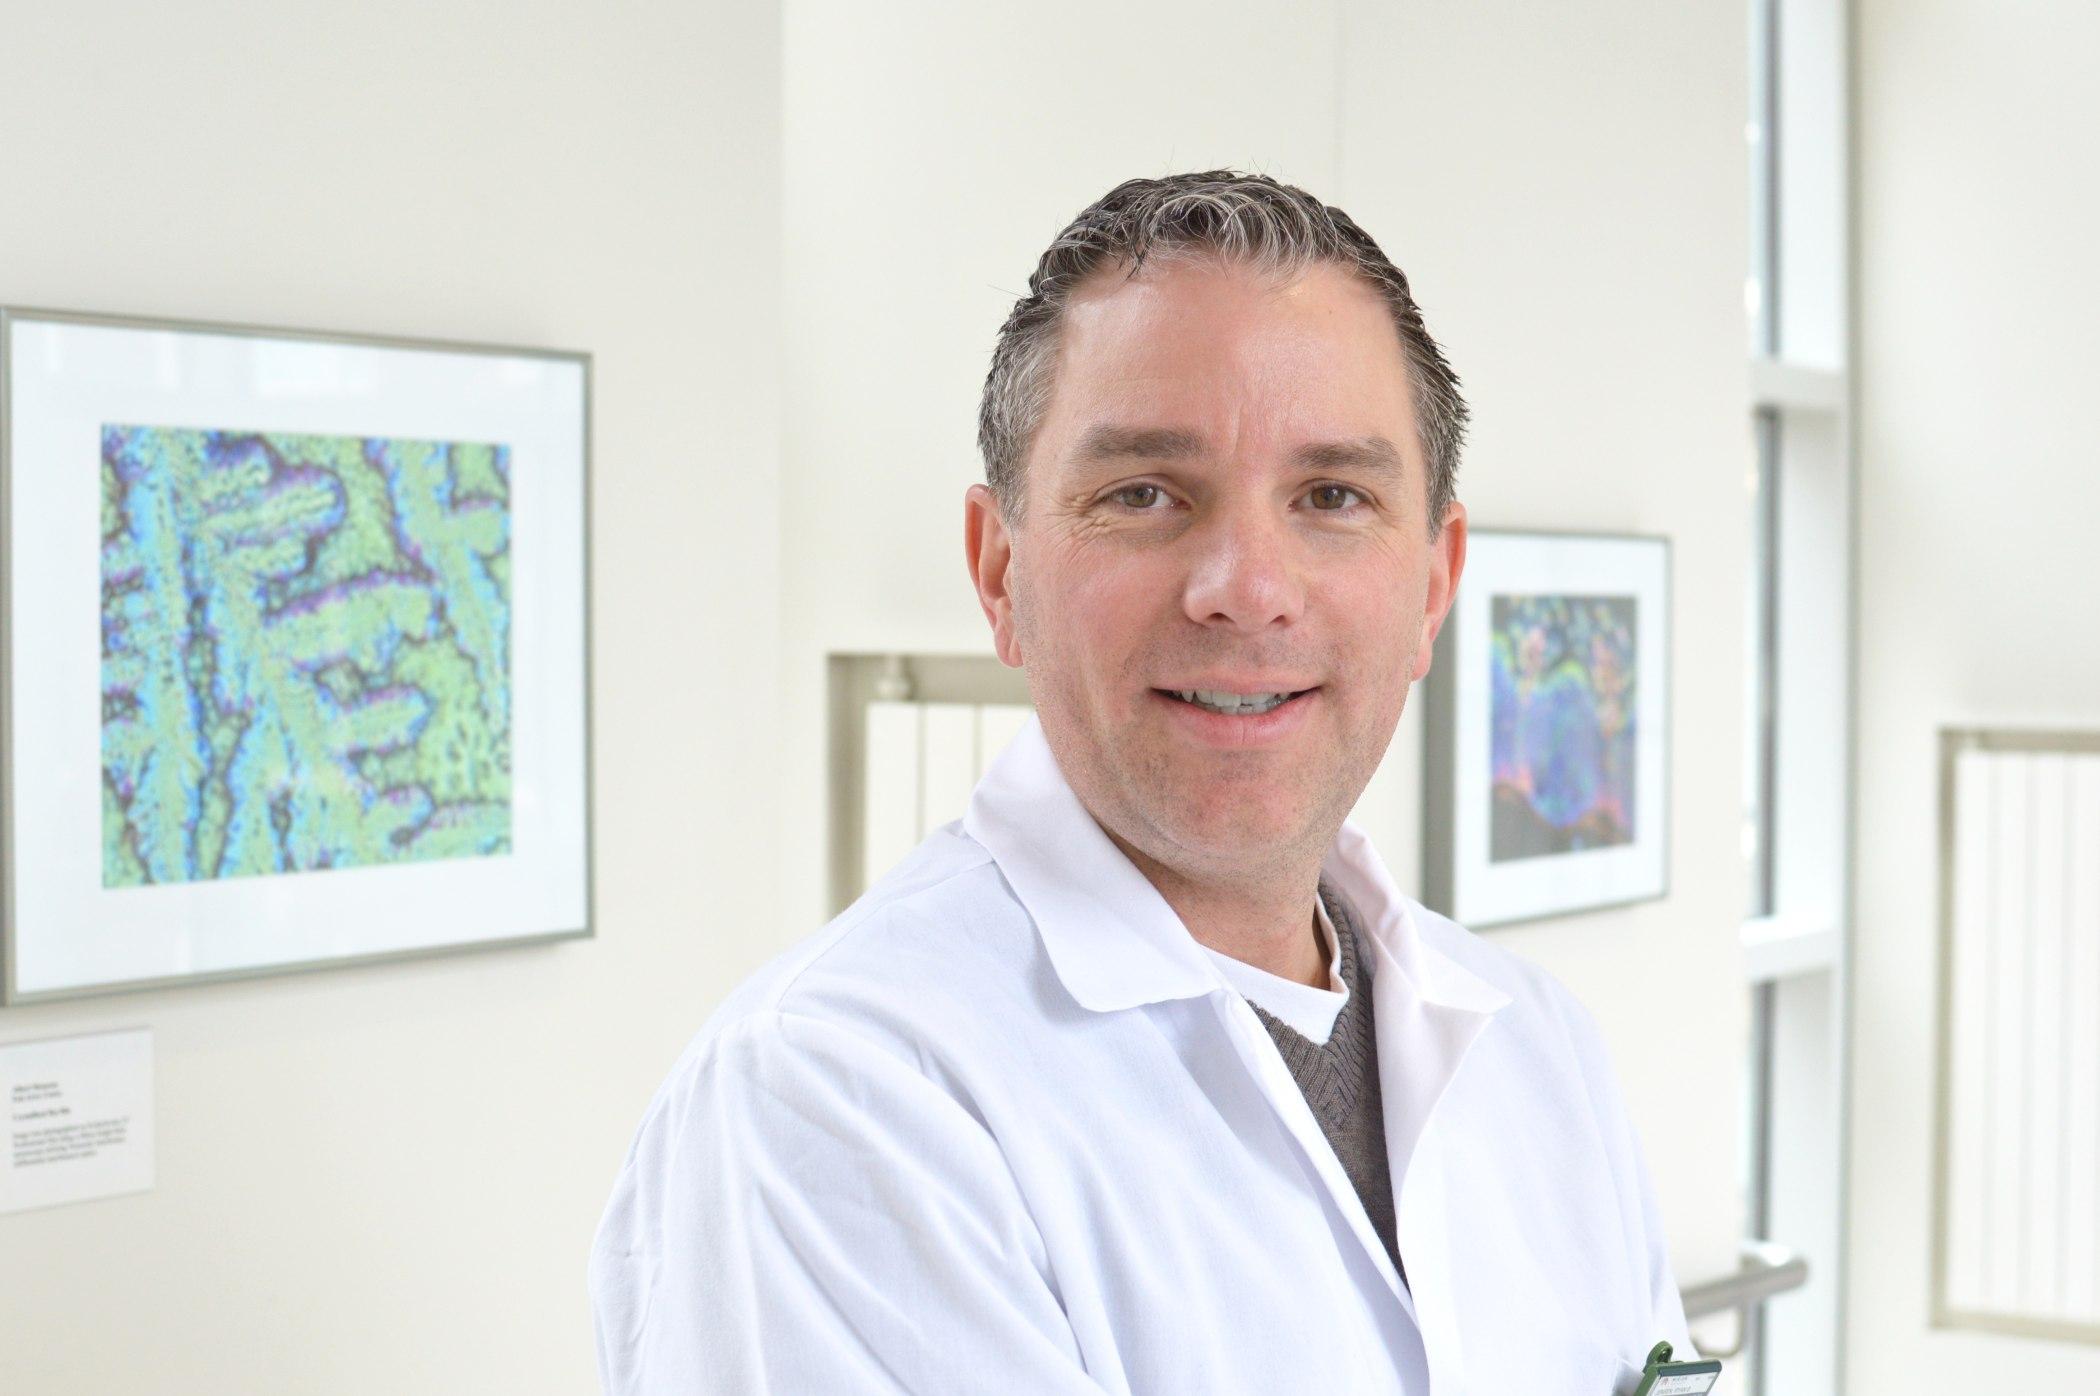 Dr. Ryan Jensen